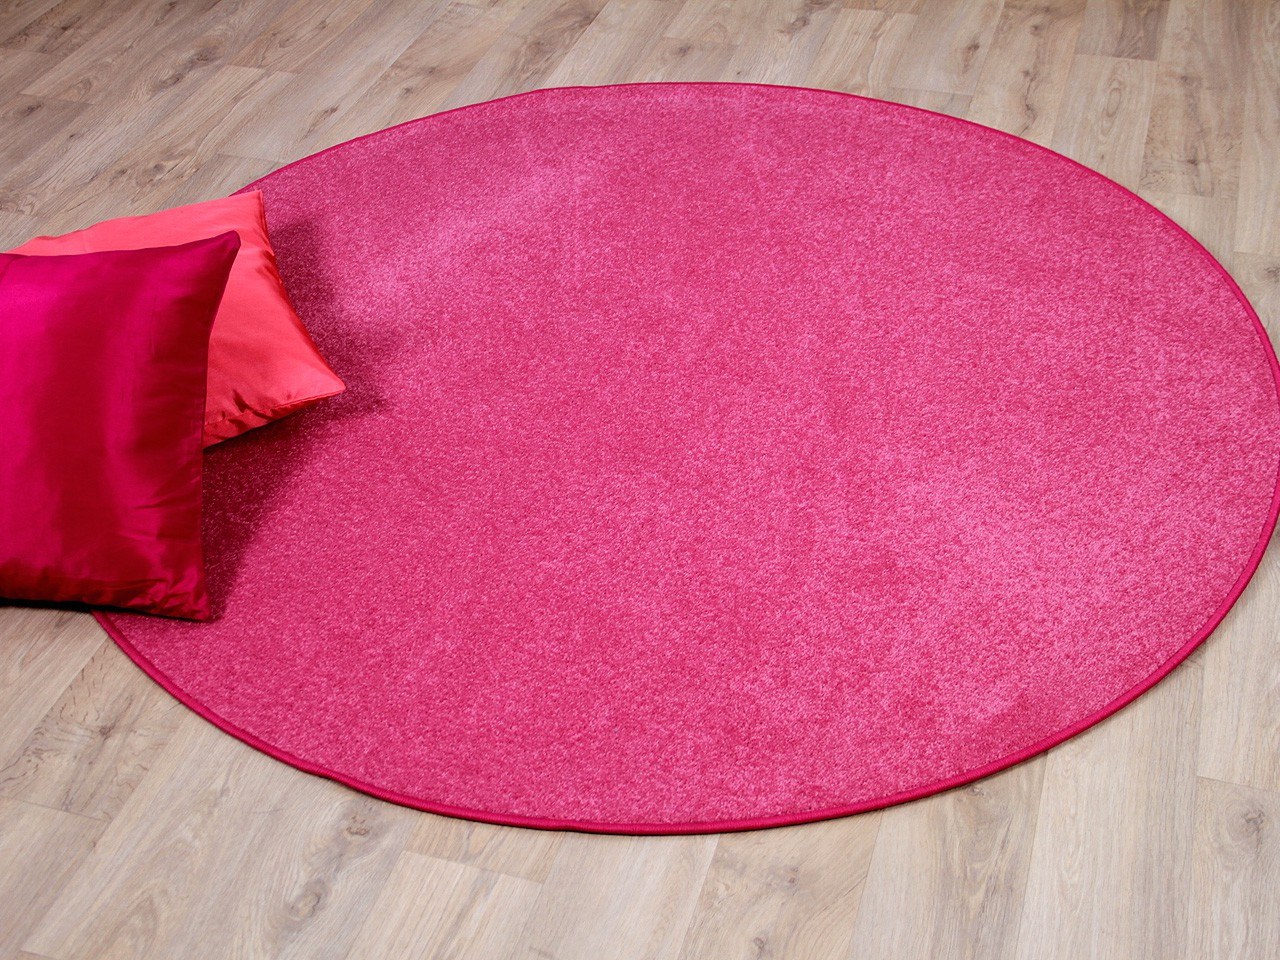 trend velours teppich joy rosa rund sonderaktion teppiche veloursteppiche trend velours joy. Black Bedroom Furniture Sets. Home Design Ideas